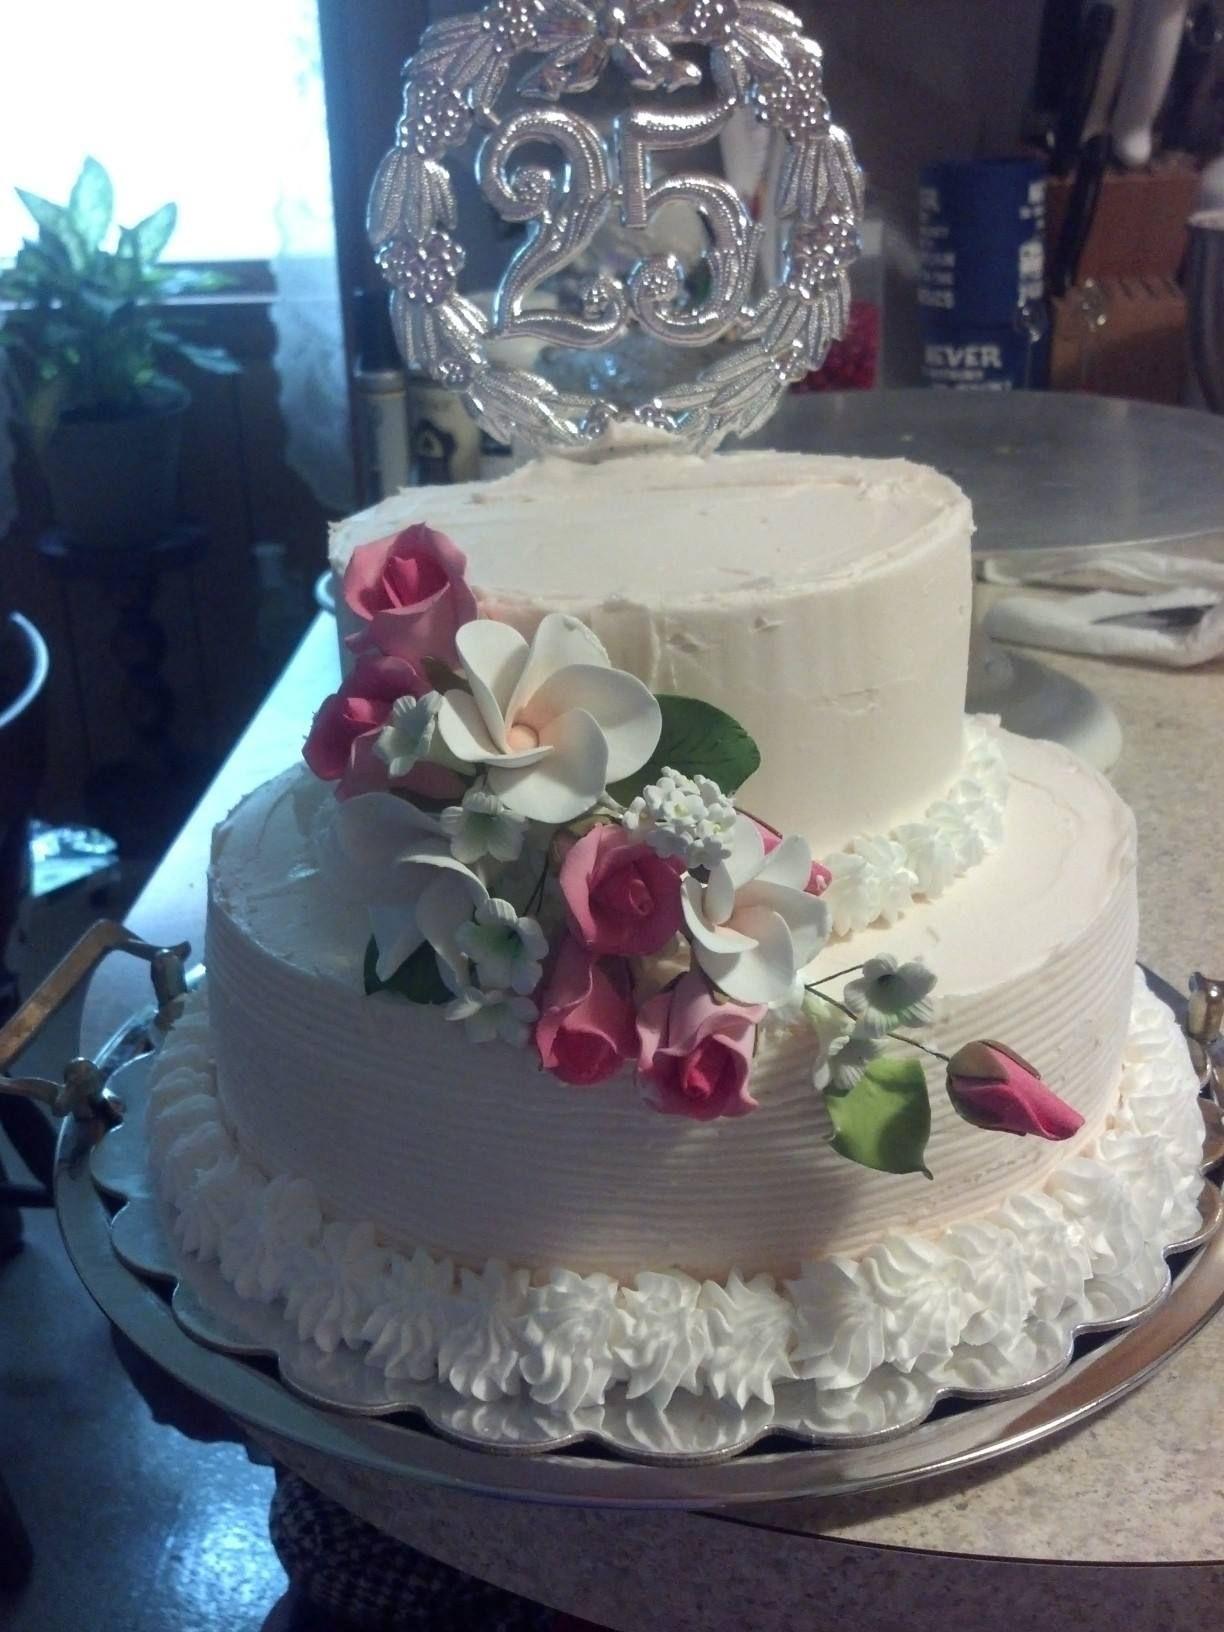 25th anniversary cake 6 9 silver wedding anniversary